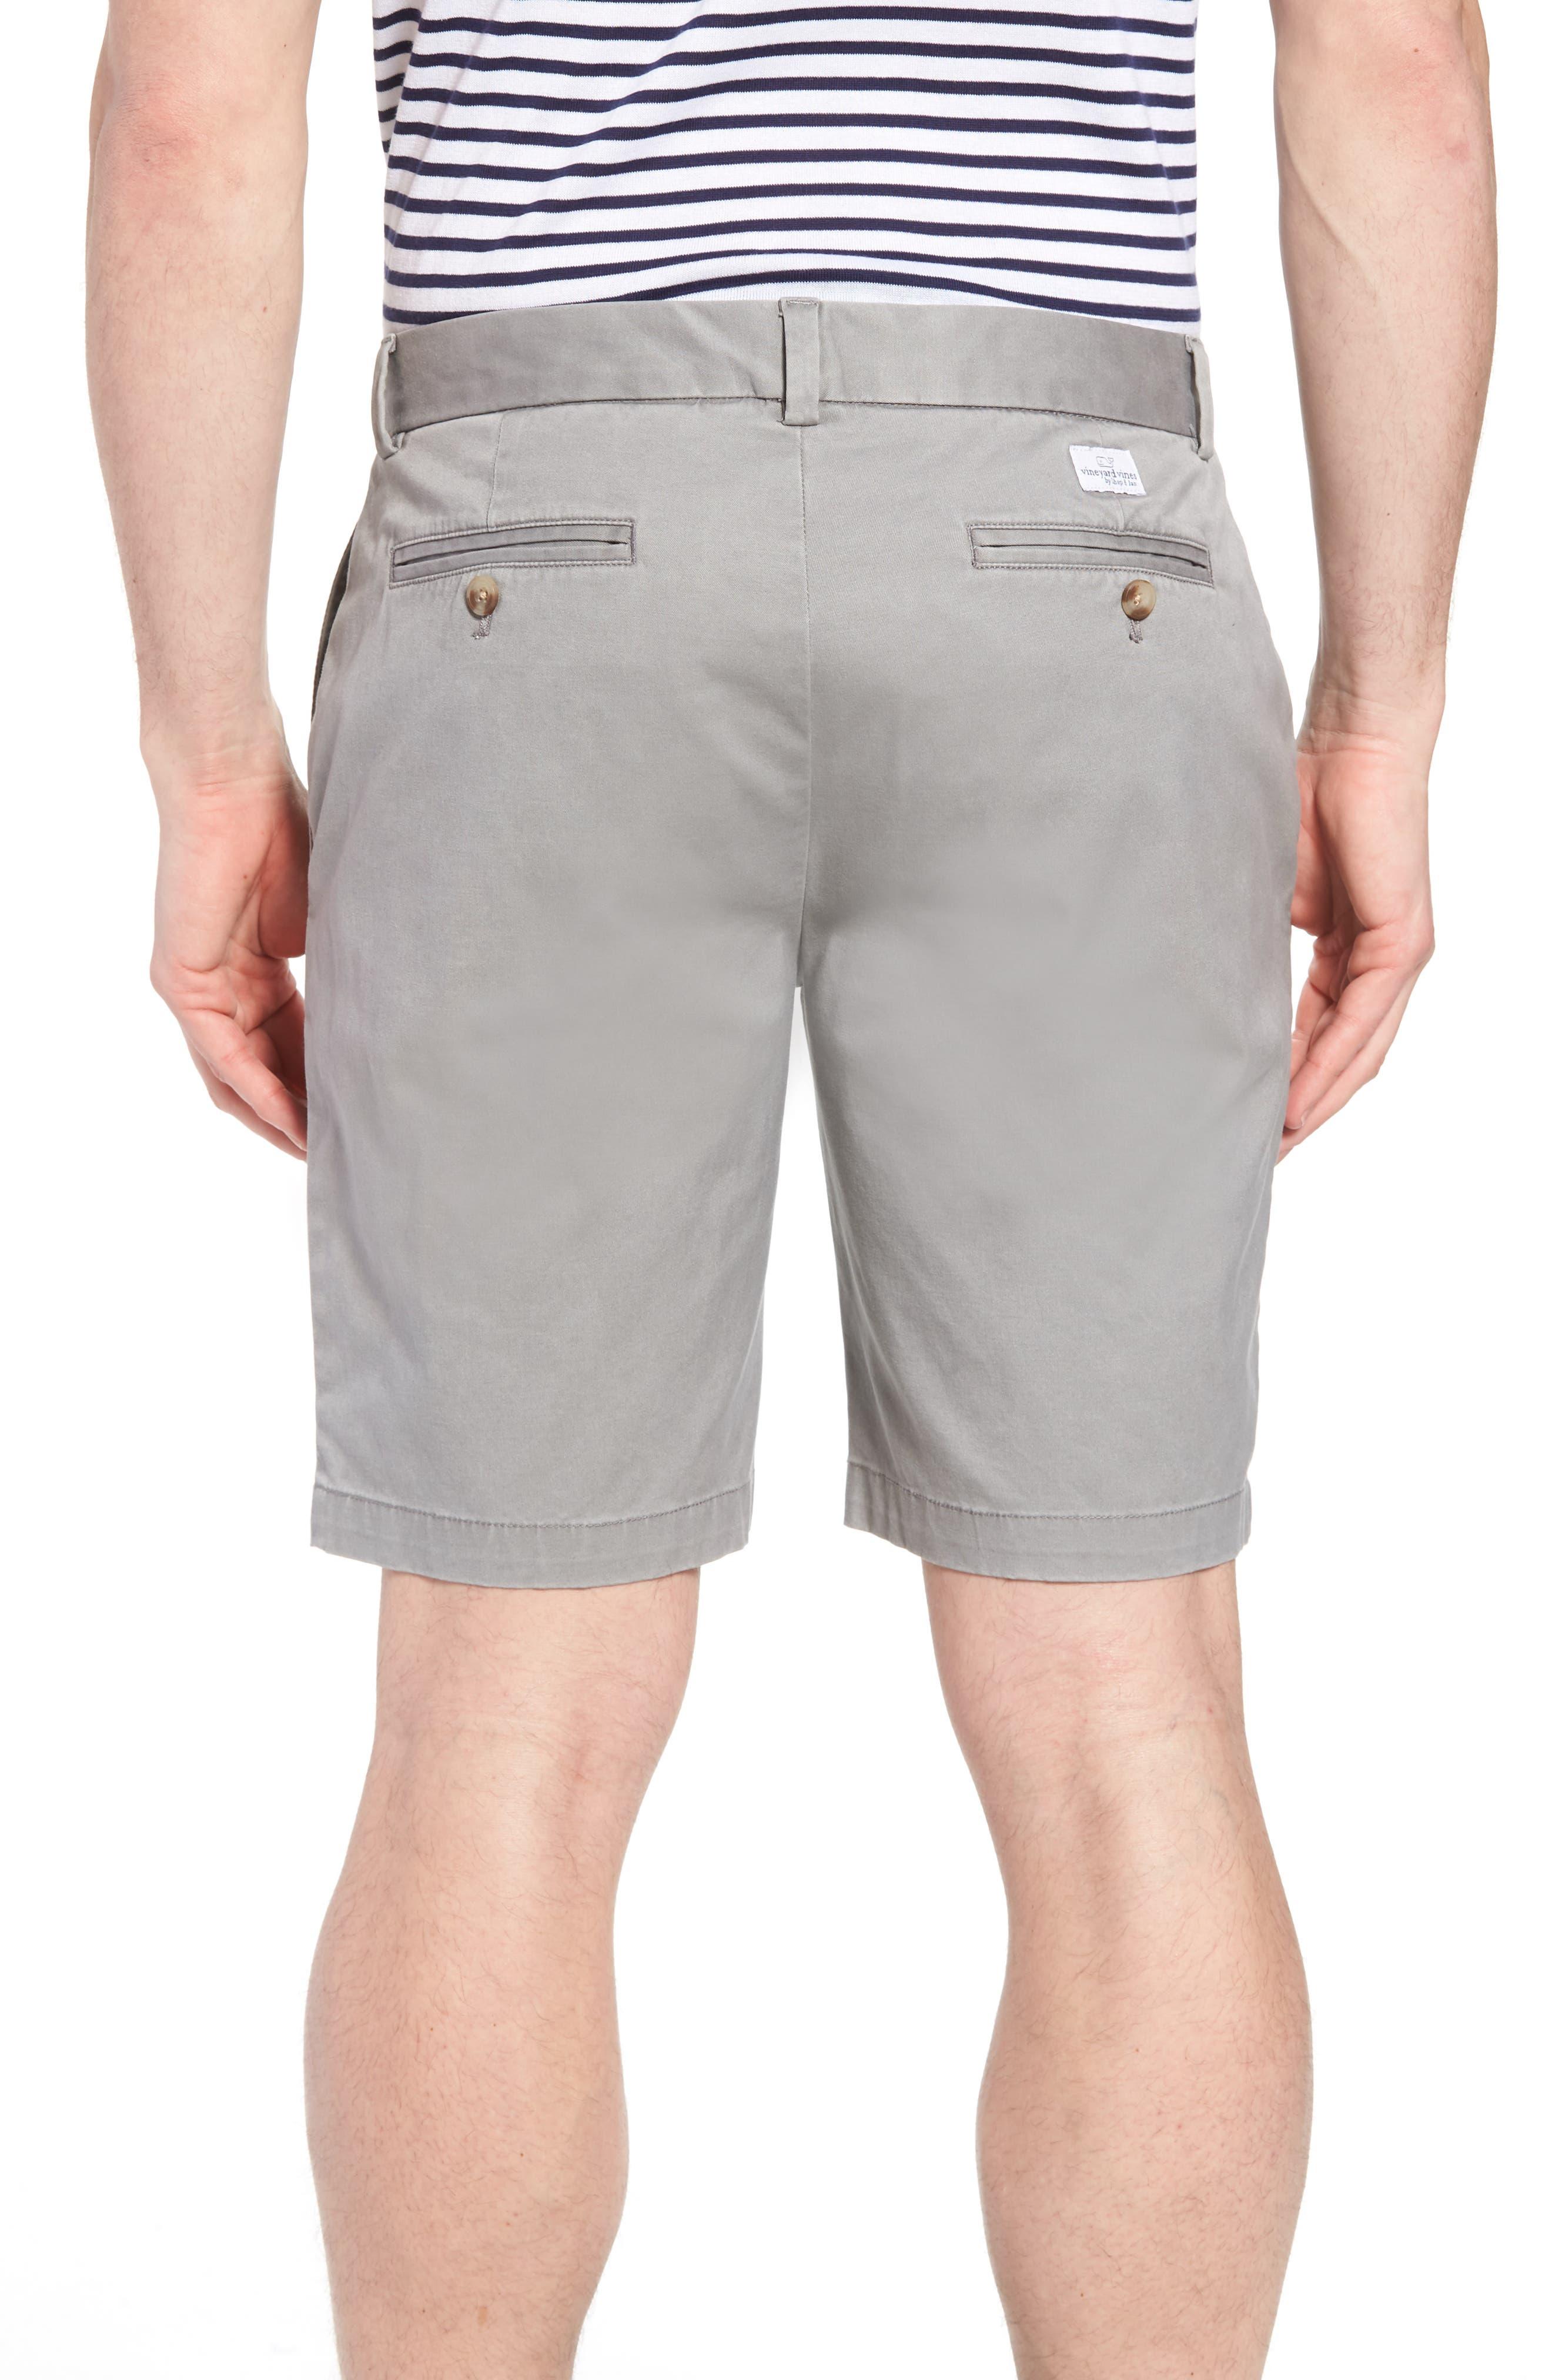 9 Inch Stretch Breaker Shorts,                             Alternate thumbnail 24, color,